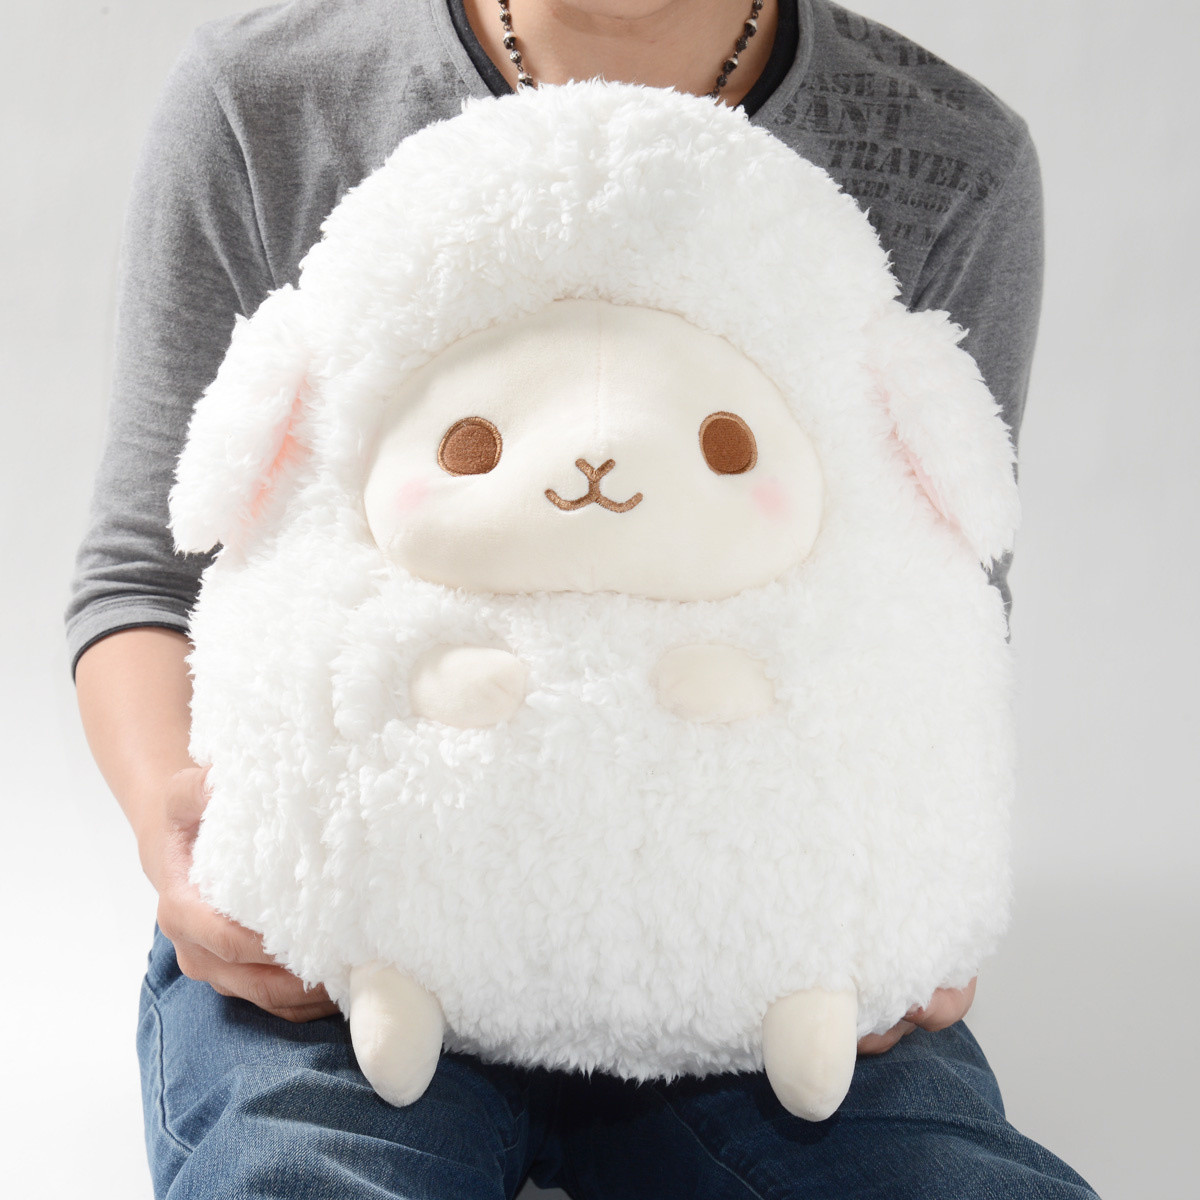 wooly baby sheep plush collection big tokyo otaku mode shop